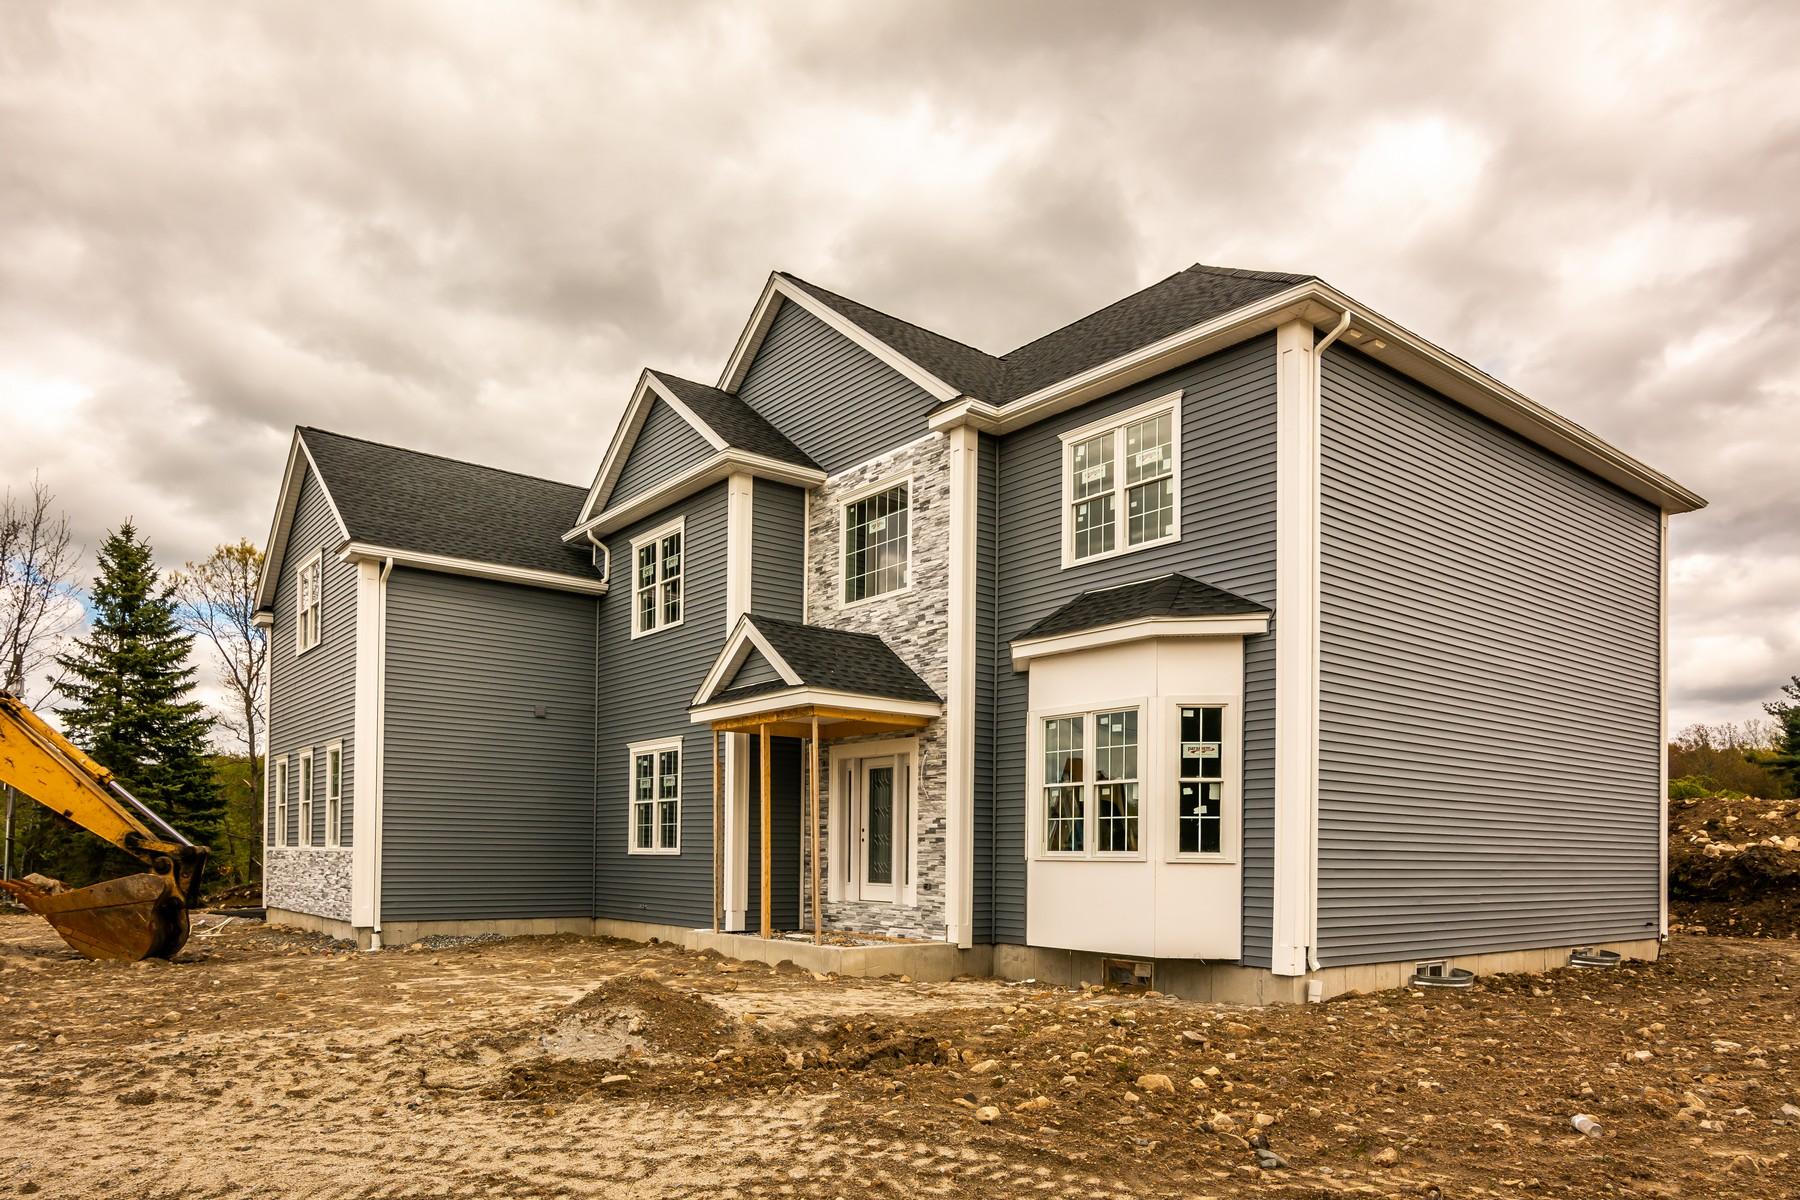 Single Family Homes pour l Vente à Impressive, Customized Colonial Style Home 20 Lackey Street Westborough, Massachusetts 01581 États-Unis